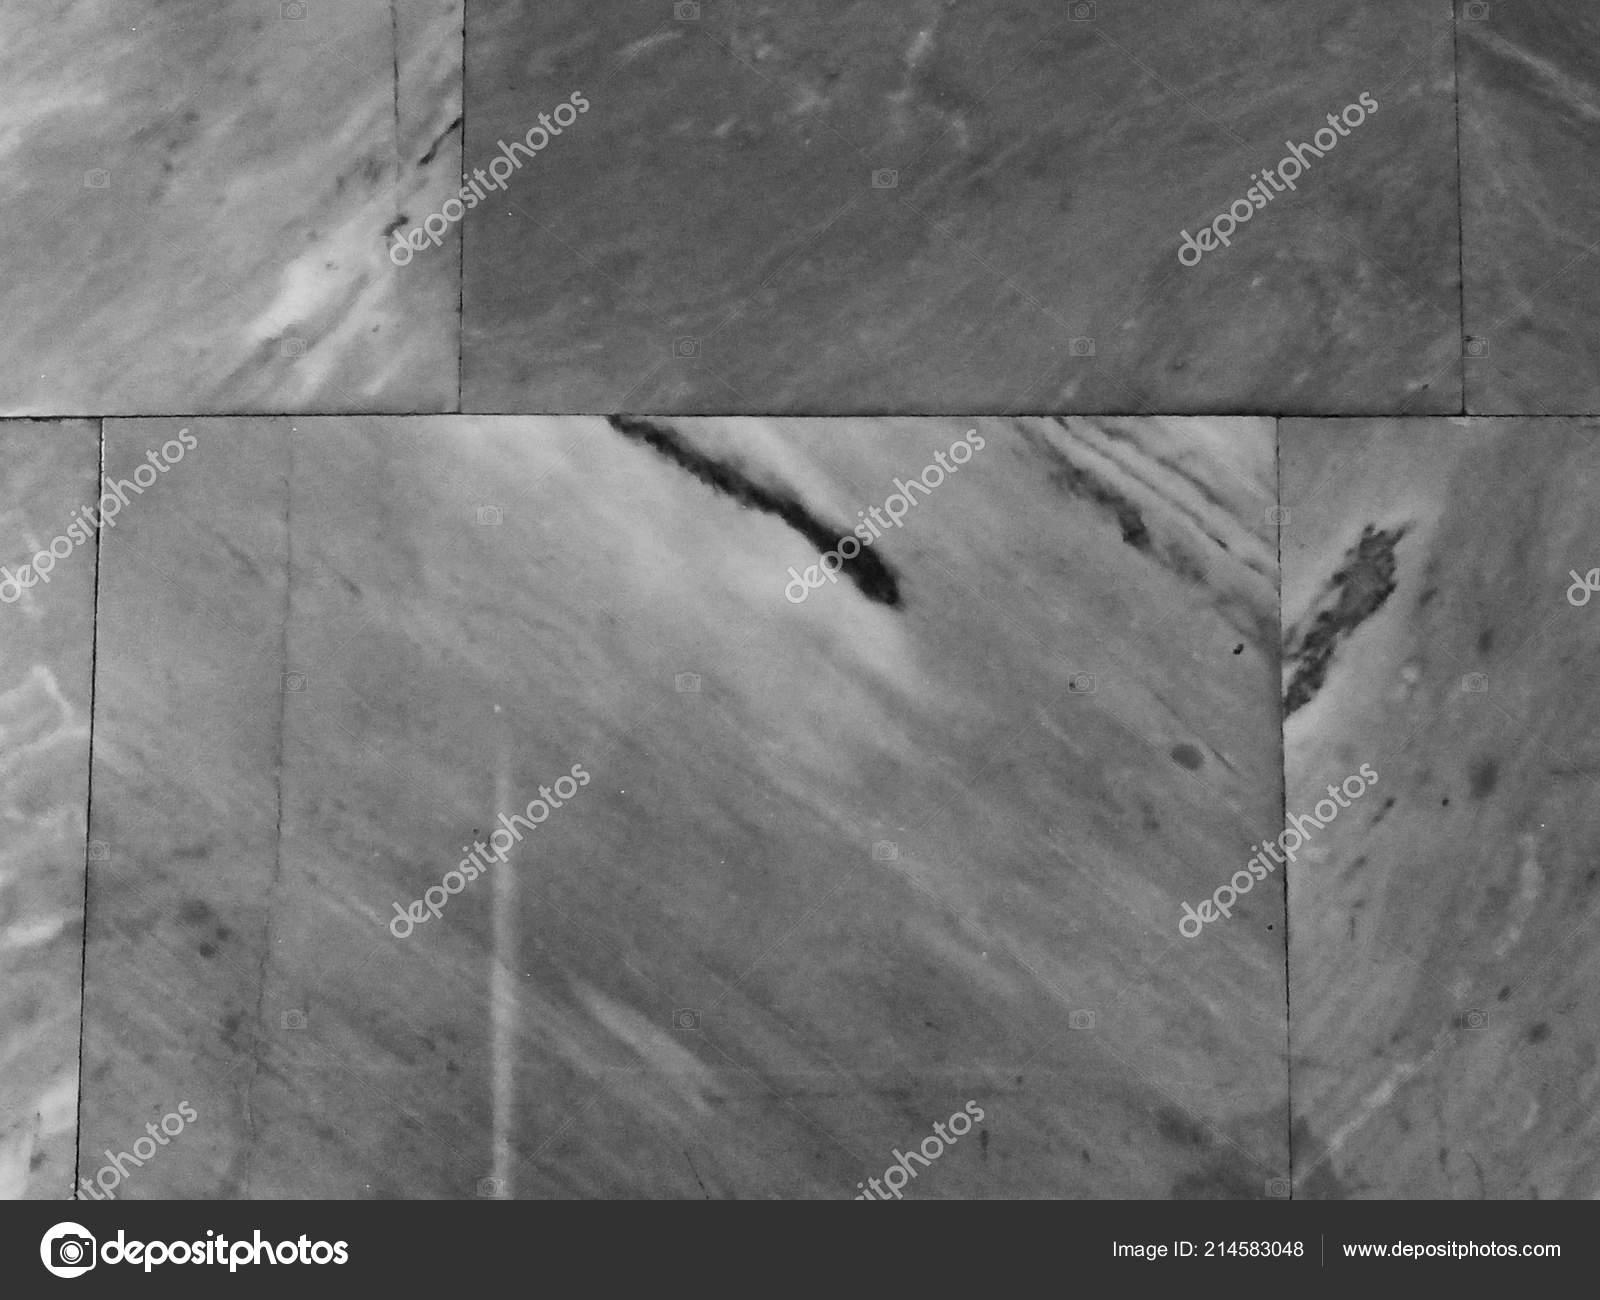 Marmo piastrelle texture pavimento piastrelle muro sfondo bianco